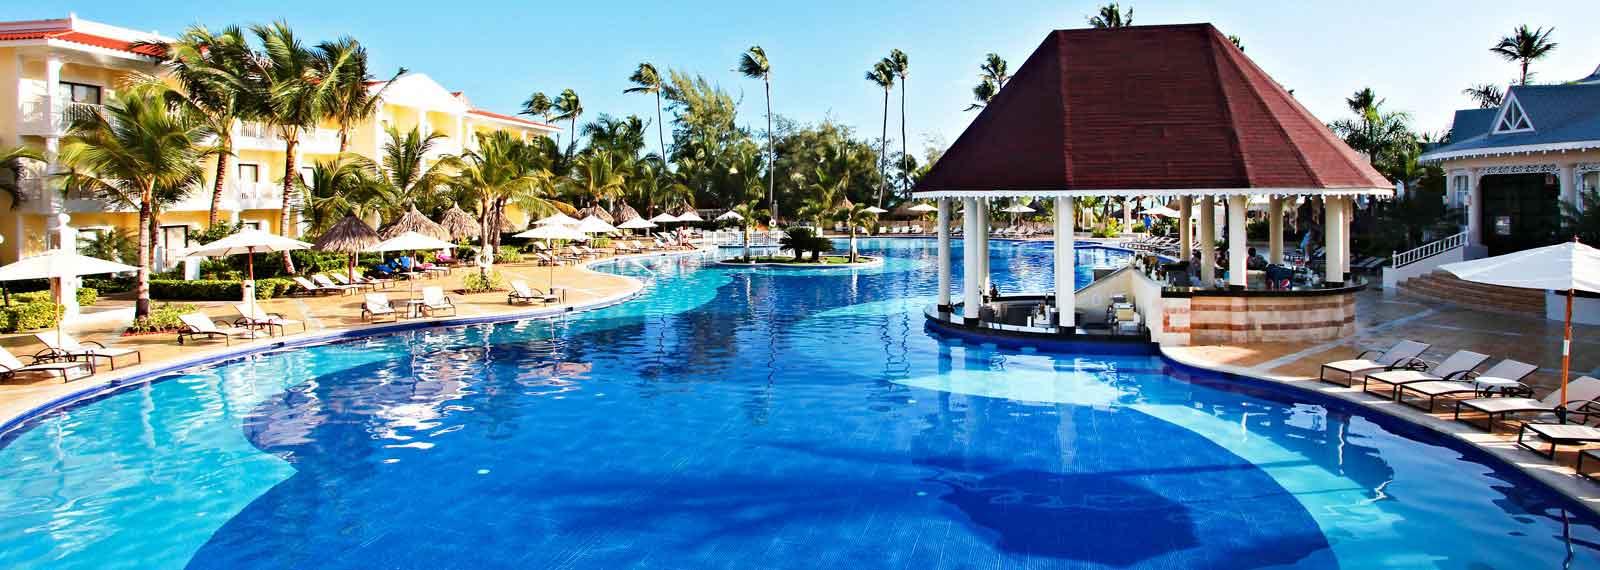 https://www.bahia-principe.com/en/resorts-in-dominican-republic/resort-esmeralda/